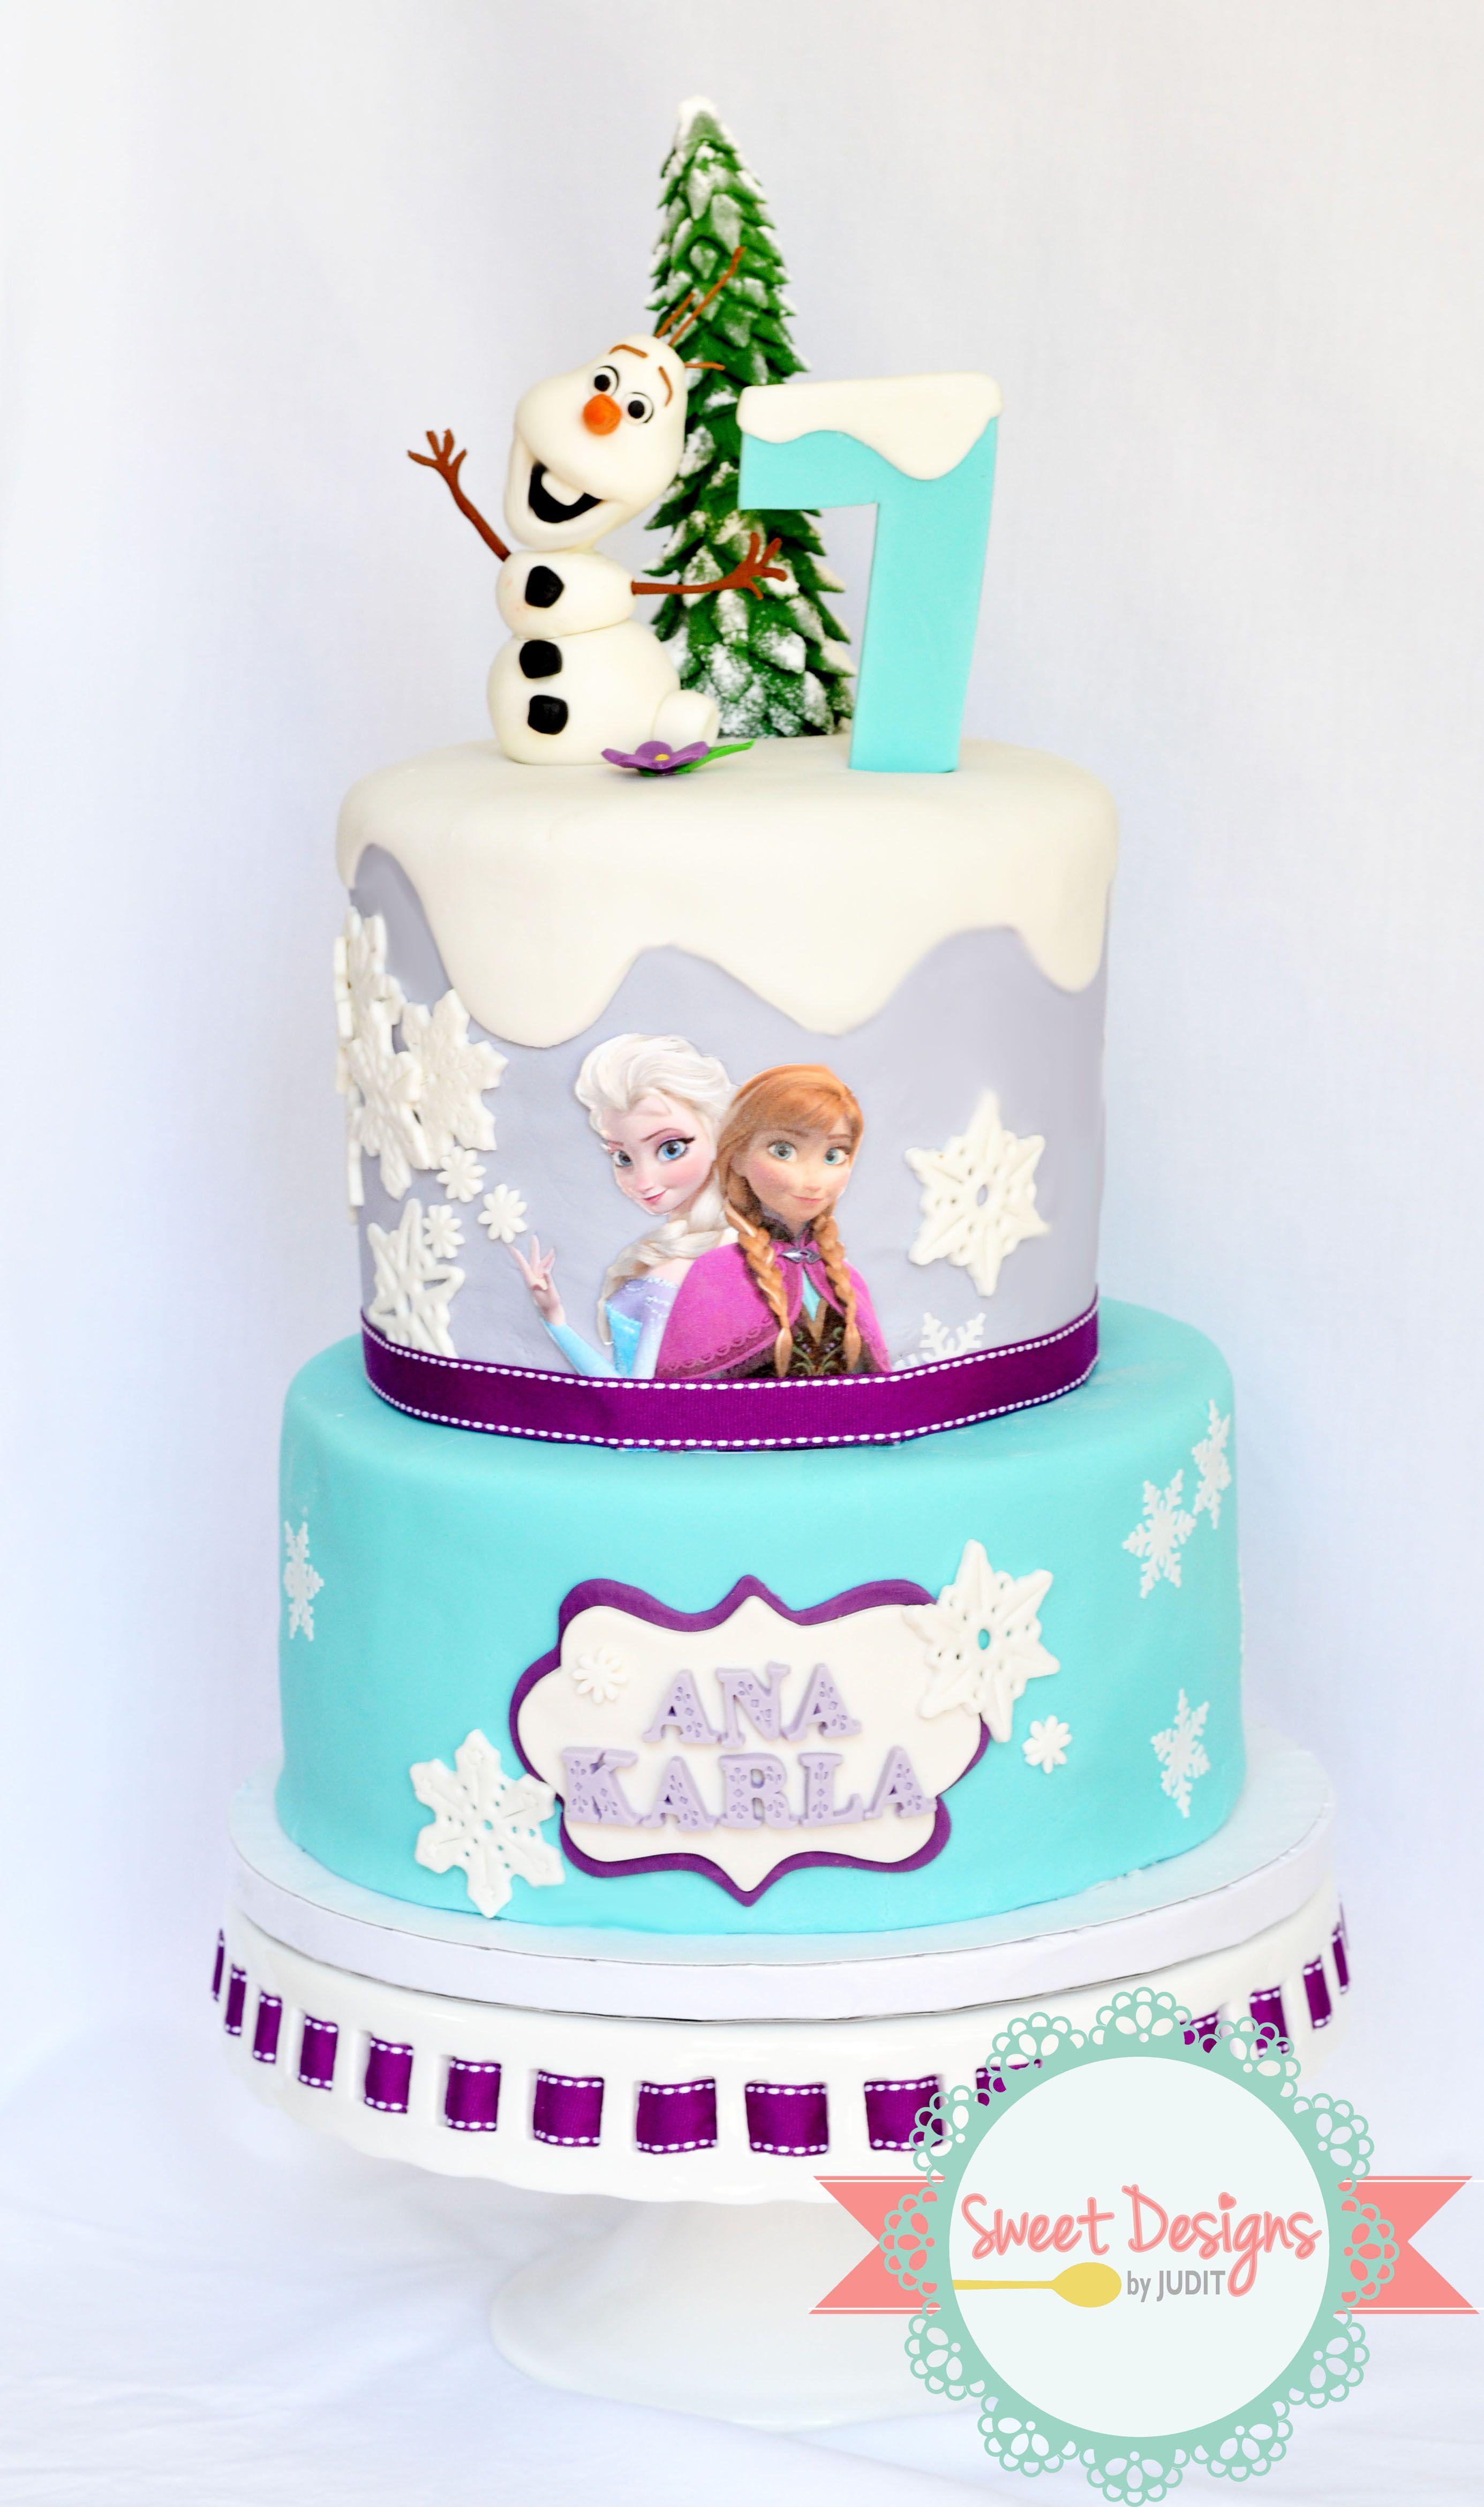 Frozen Birthday Cake - thank you @Toni White  for your help!!